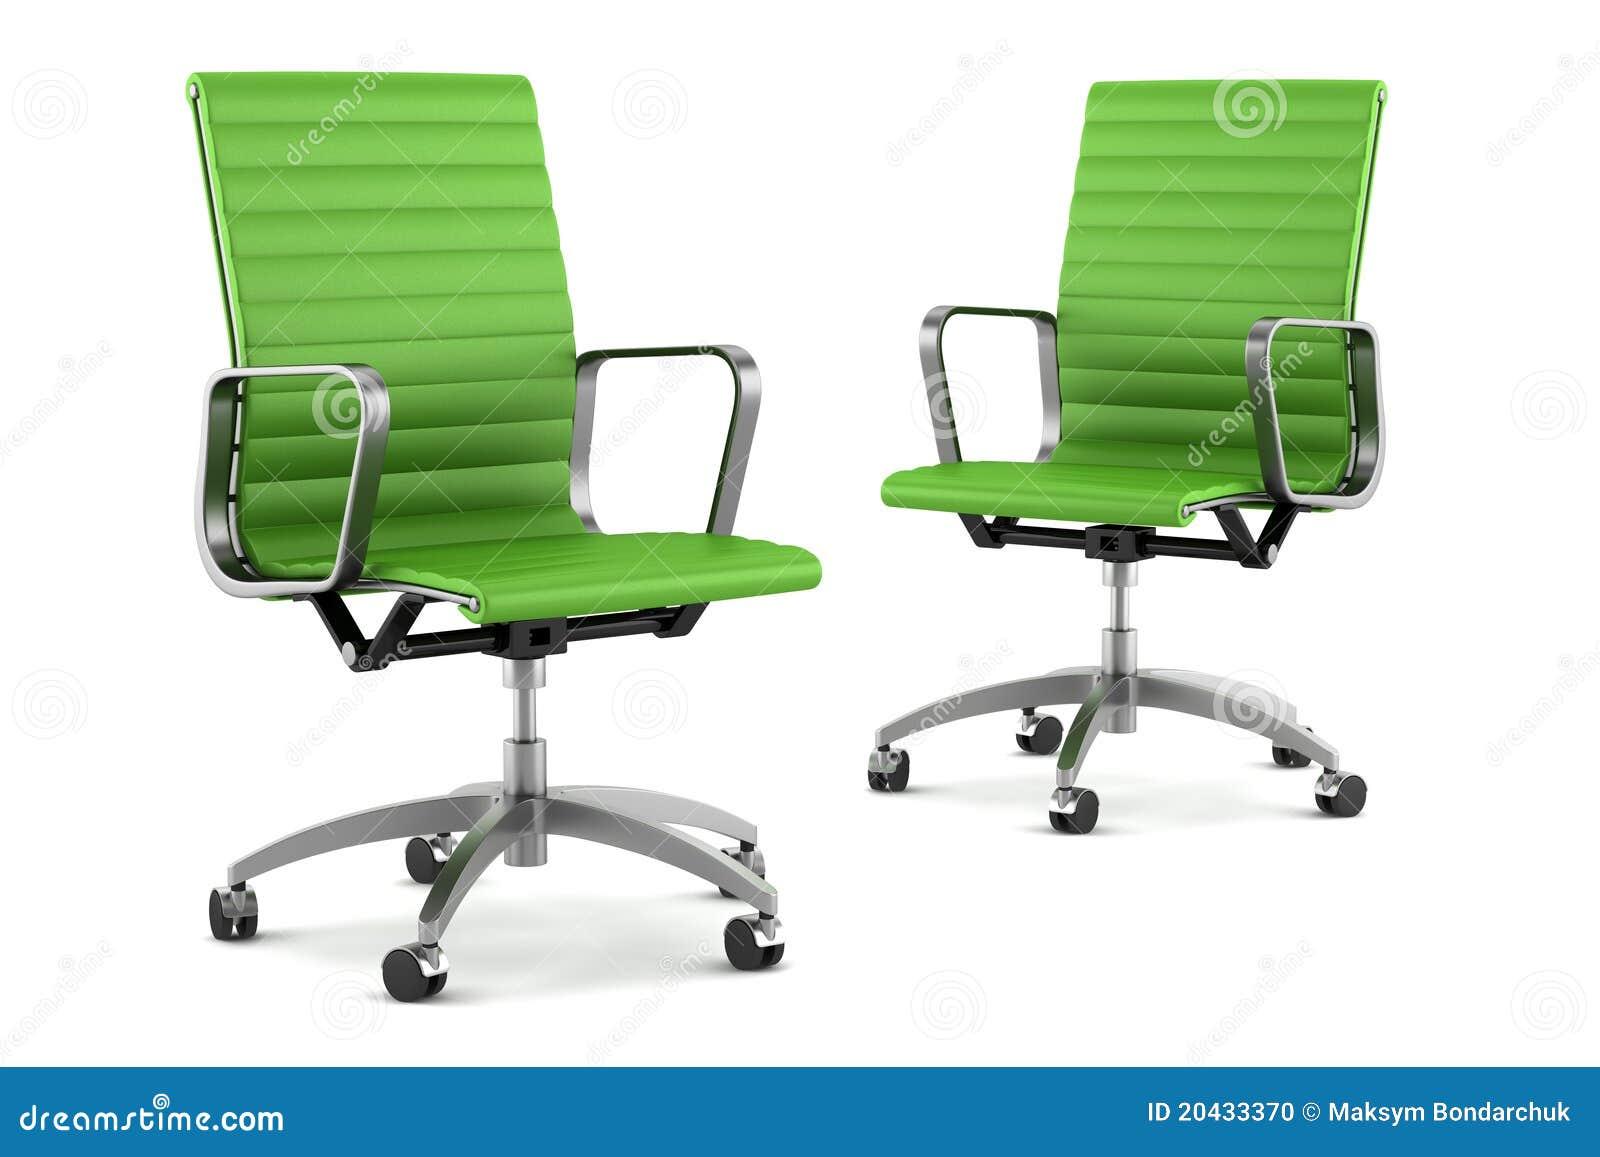 Moderne Bürostühle zwei moderne grüne bürostühle auf weiß stock abbildung